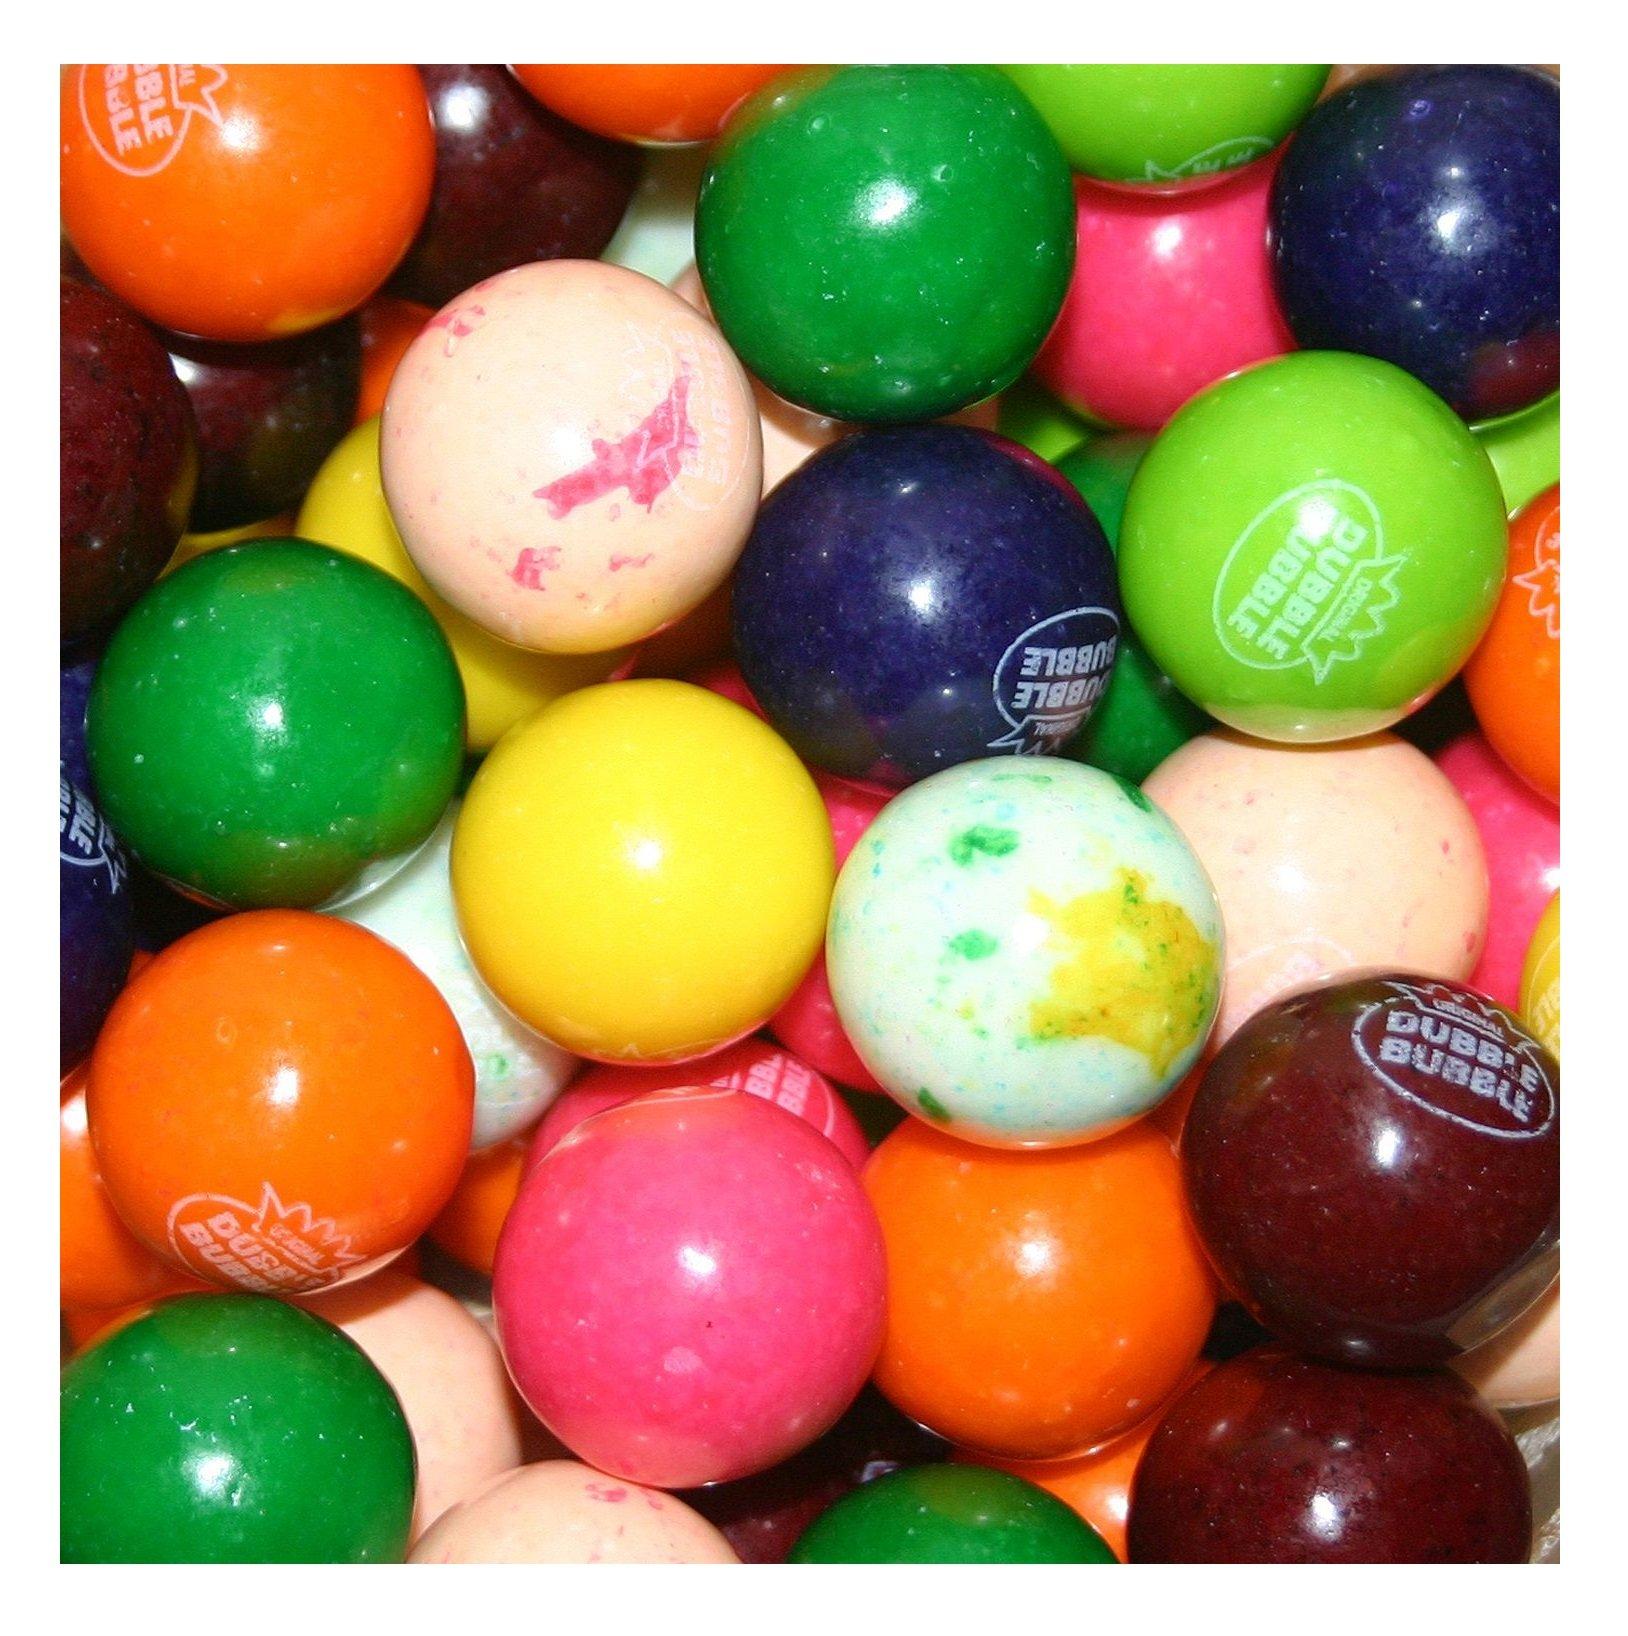 Dubble Bubble Special Mix 10 Color/Flavor Assorted Gumballs - 24mm or 1 inch 850 ct. by Dubble Bubble (Image #1)